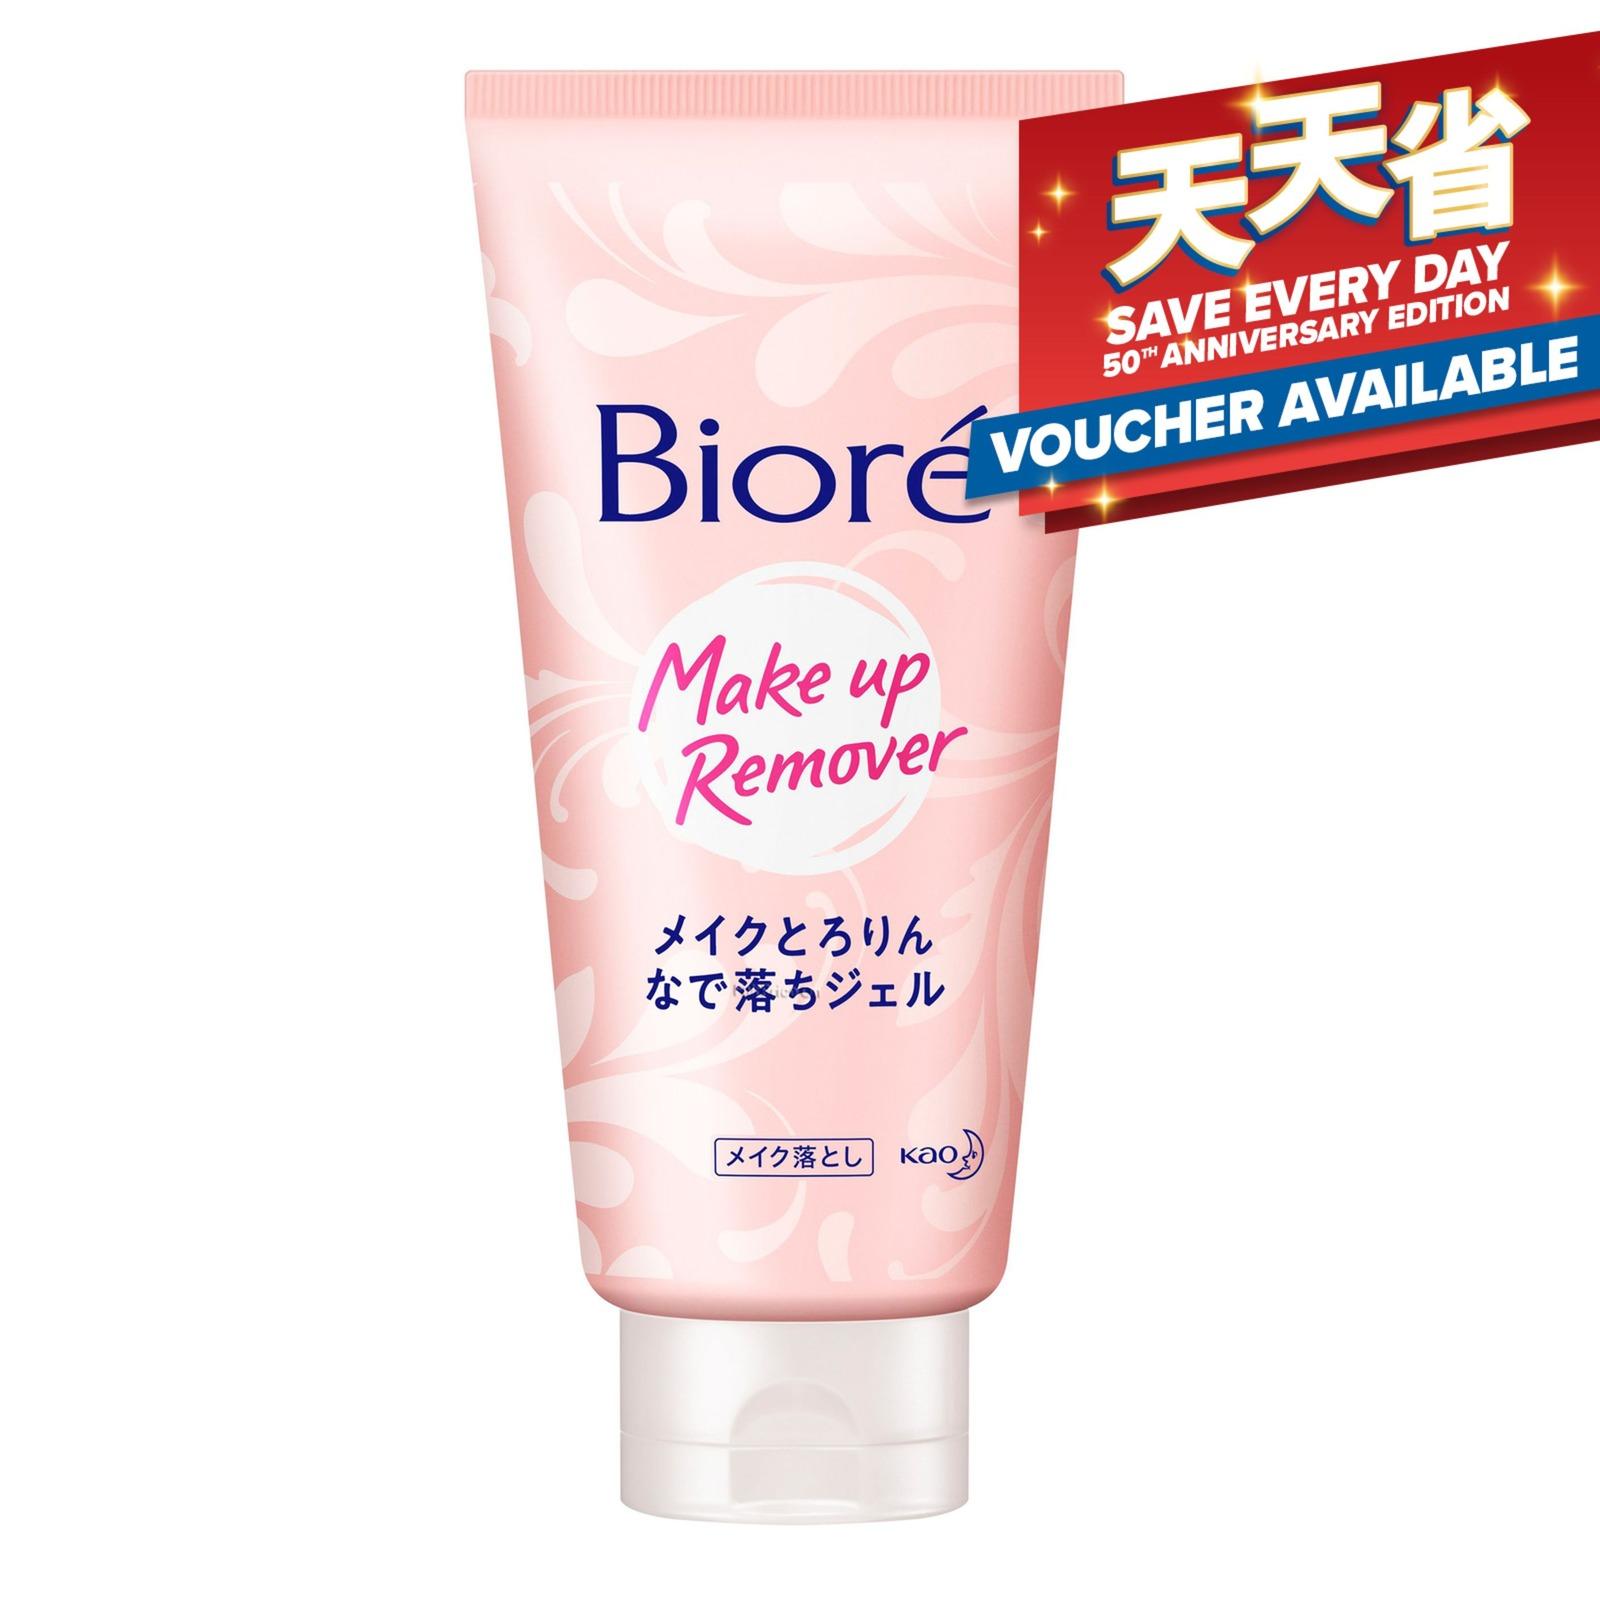 Biore Makeup Remover Cleansing Gel